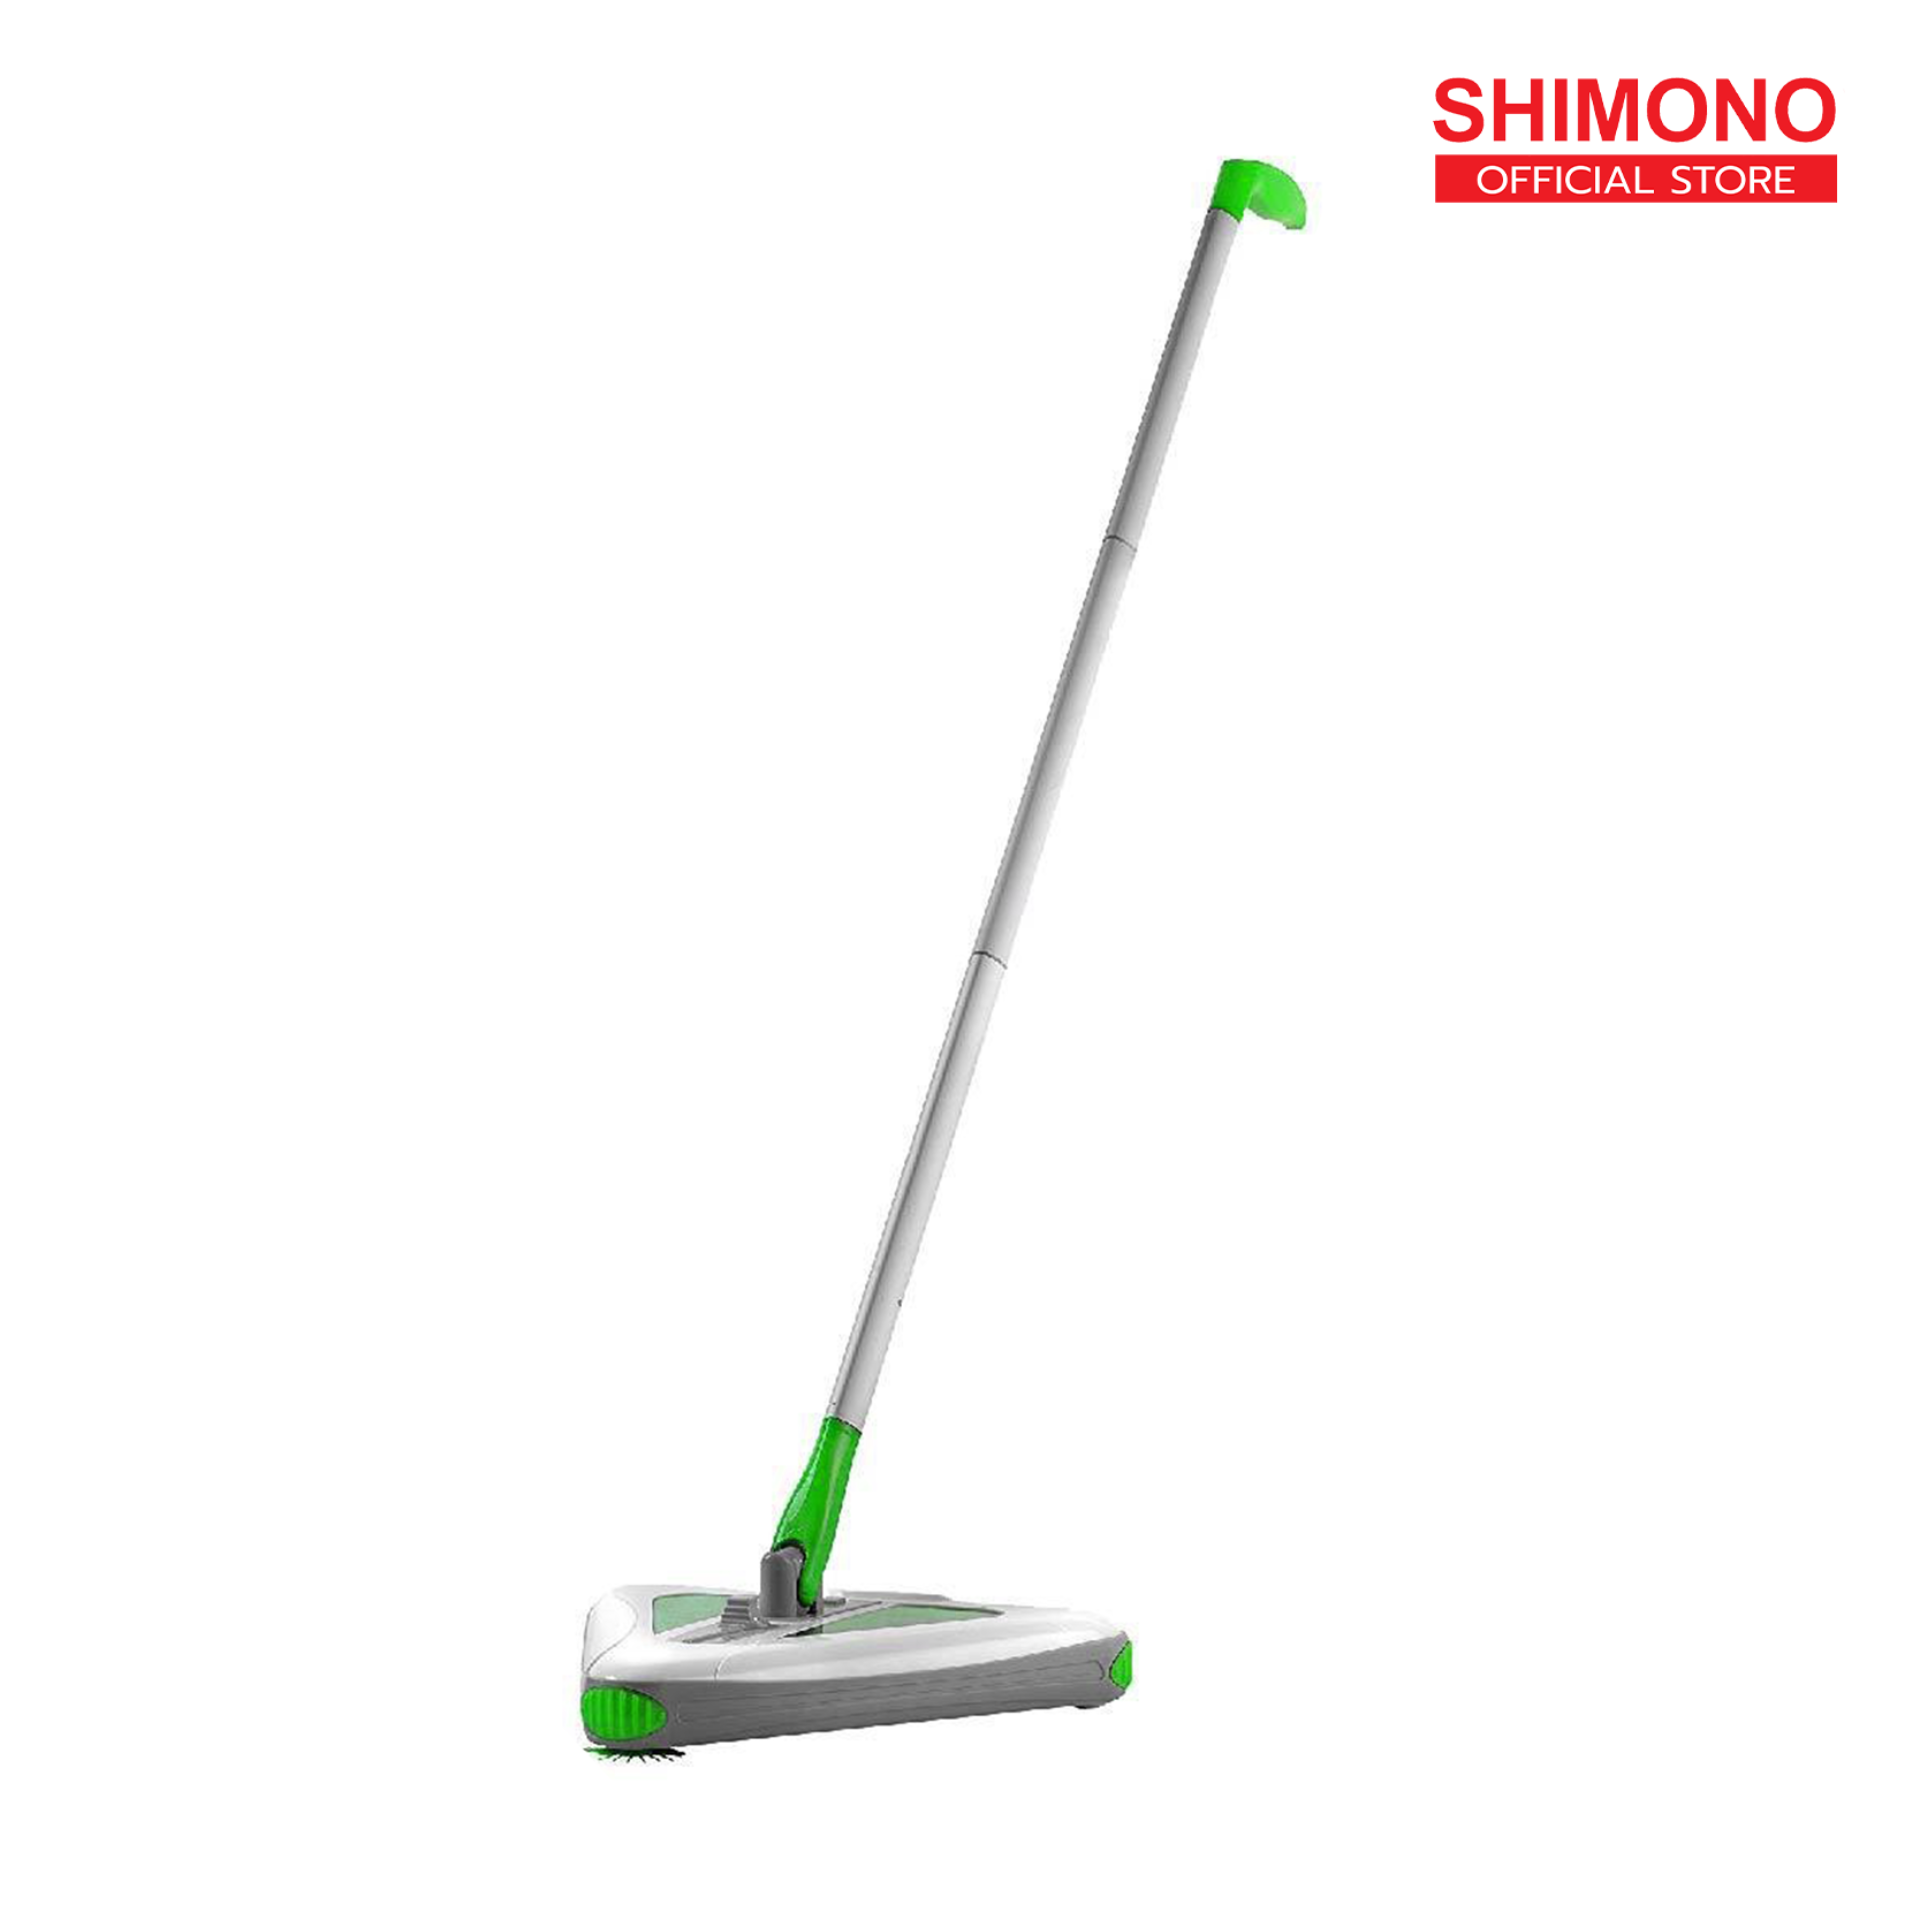 Shimono ไม้กวาดไฟฟ้าอัจฉริยะ SW-3737 ไม้กวาดสามเหลี่ยม